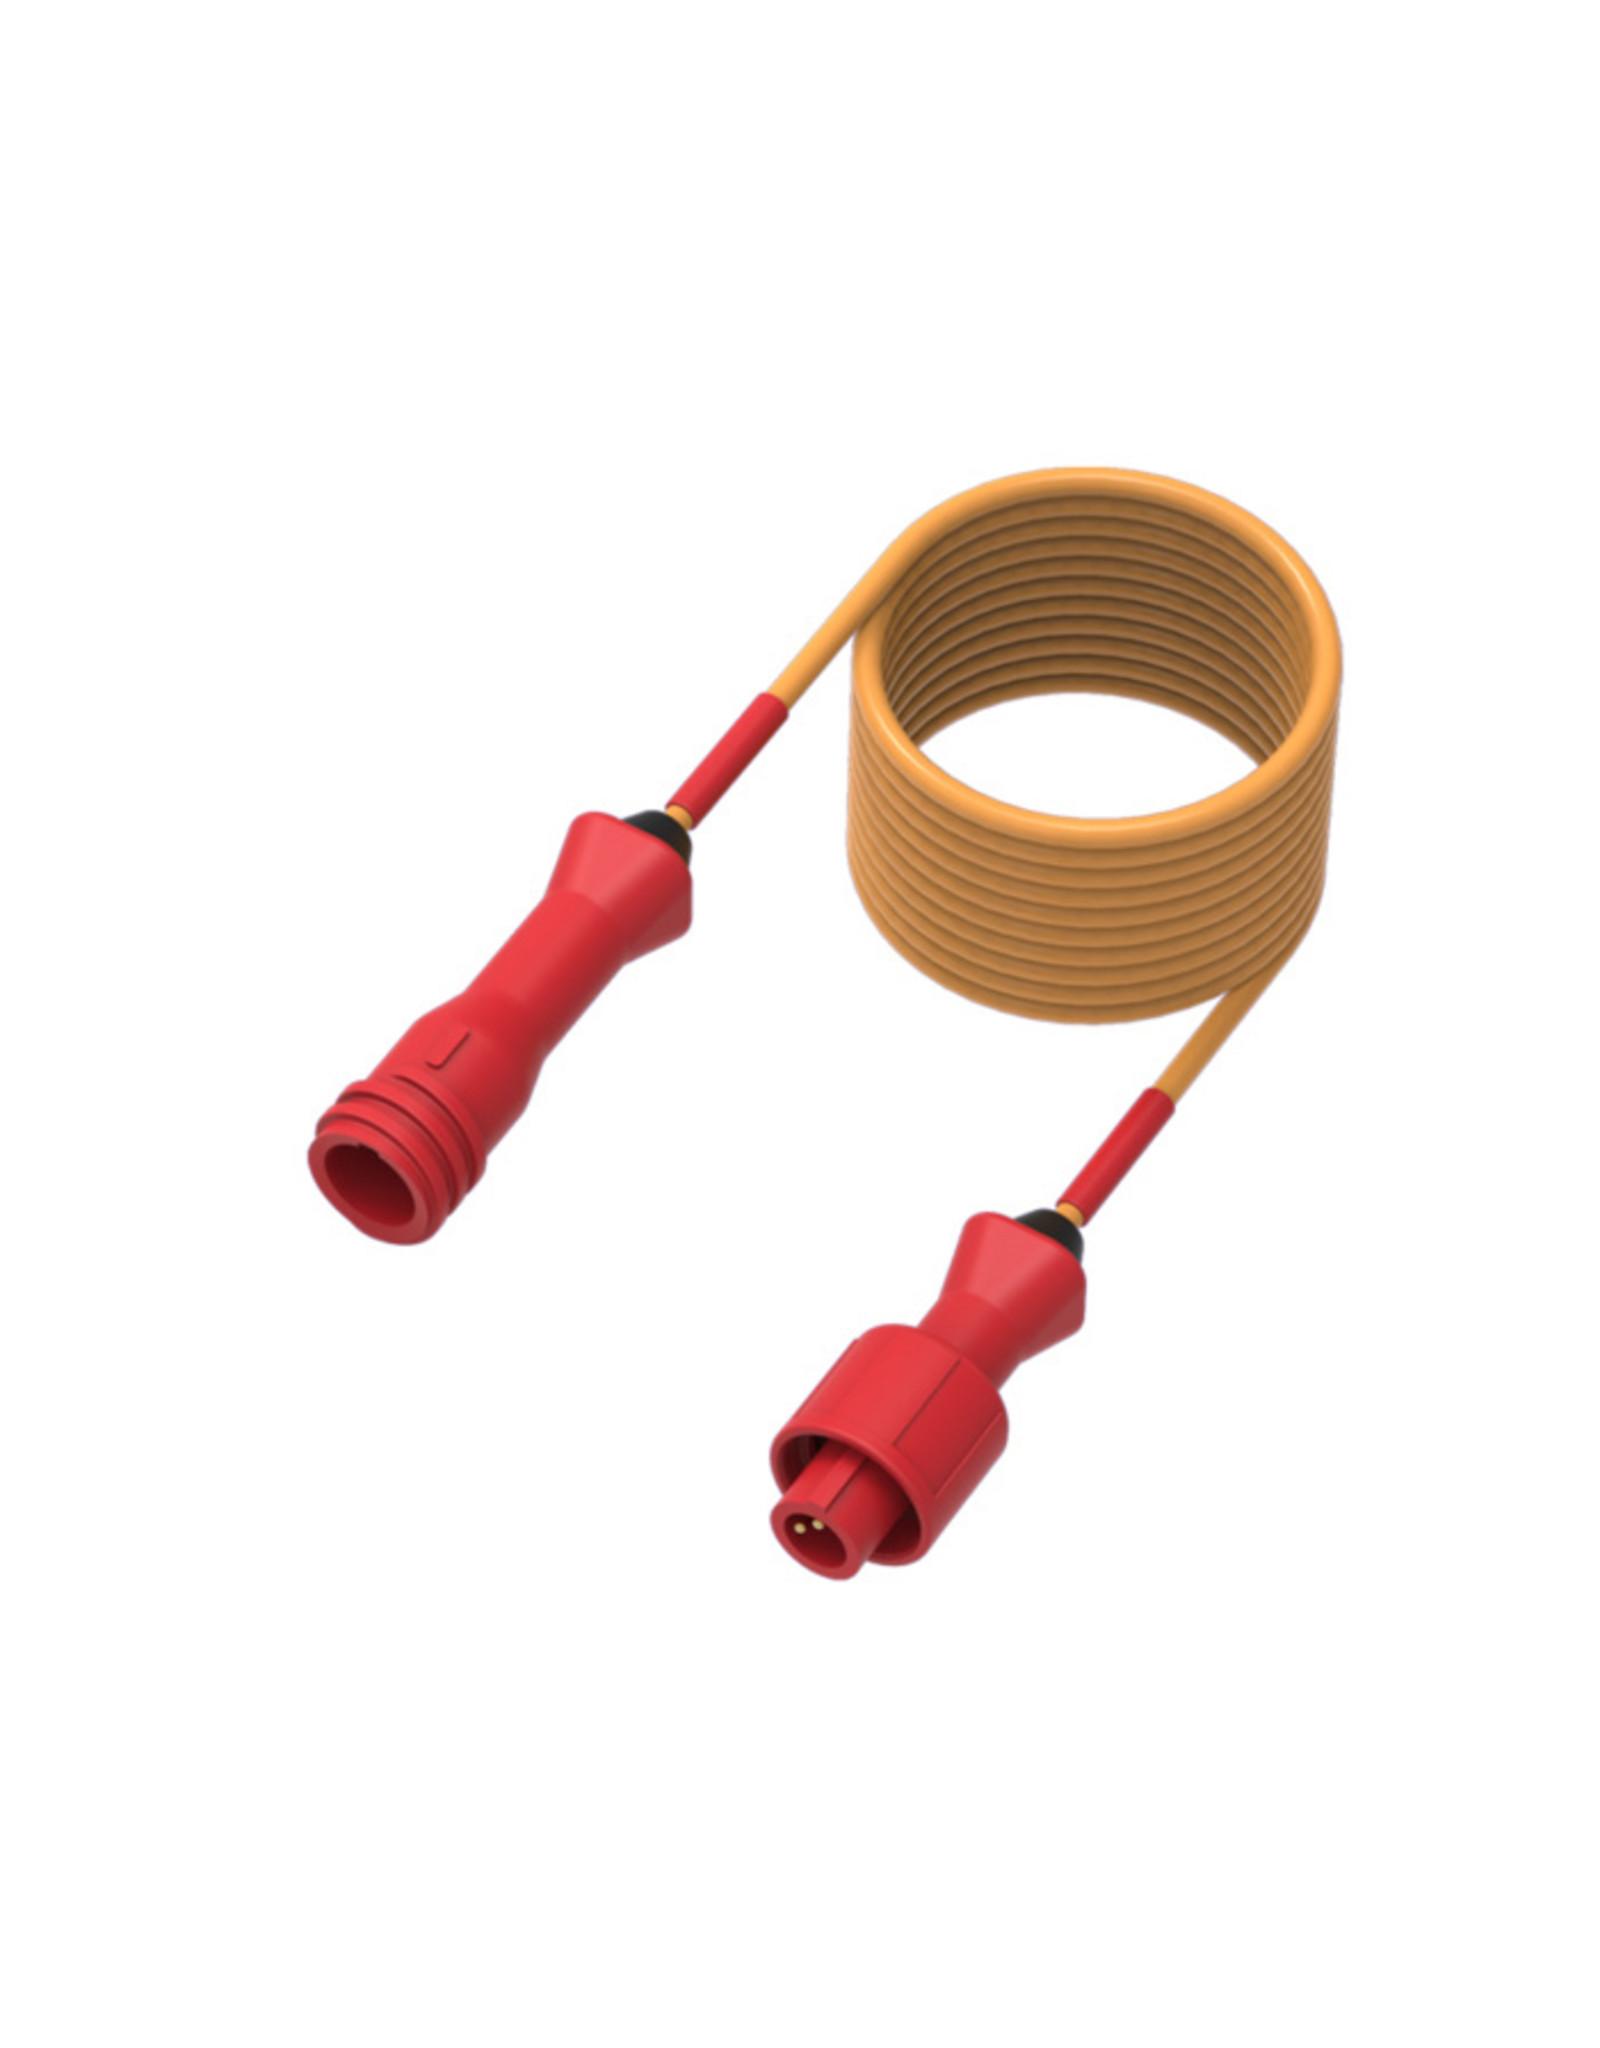 Alfano Alfano PRO 3 EVO / 6 Verlengkabel NTC (Tempratuur rood) 135CM